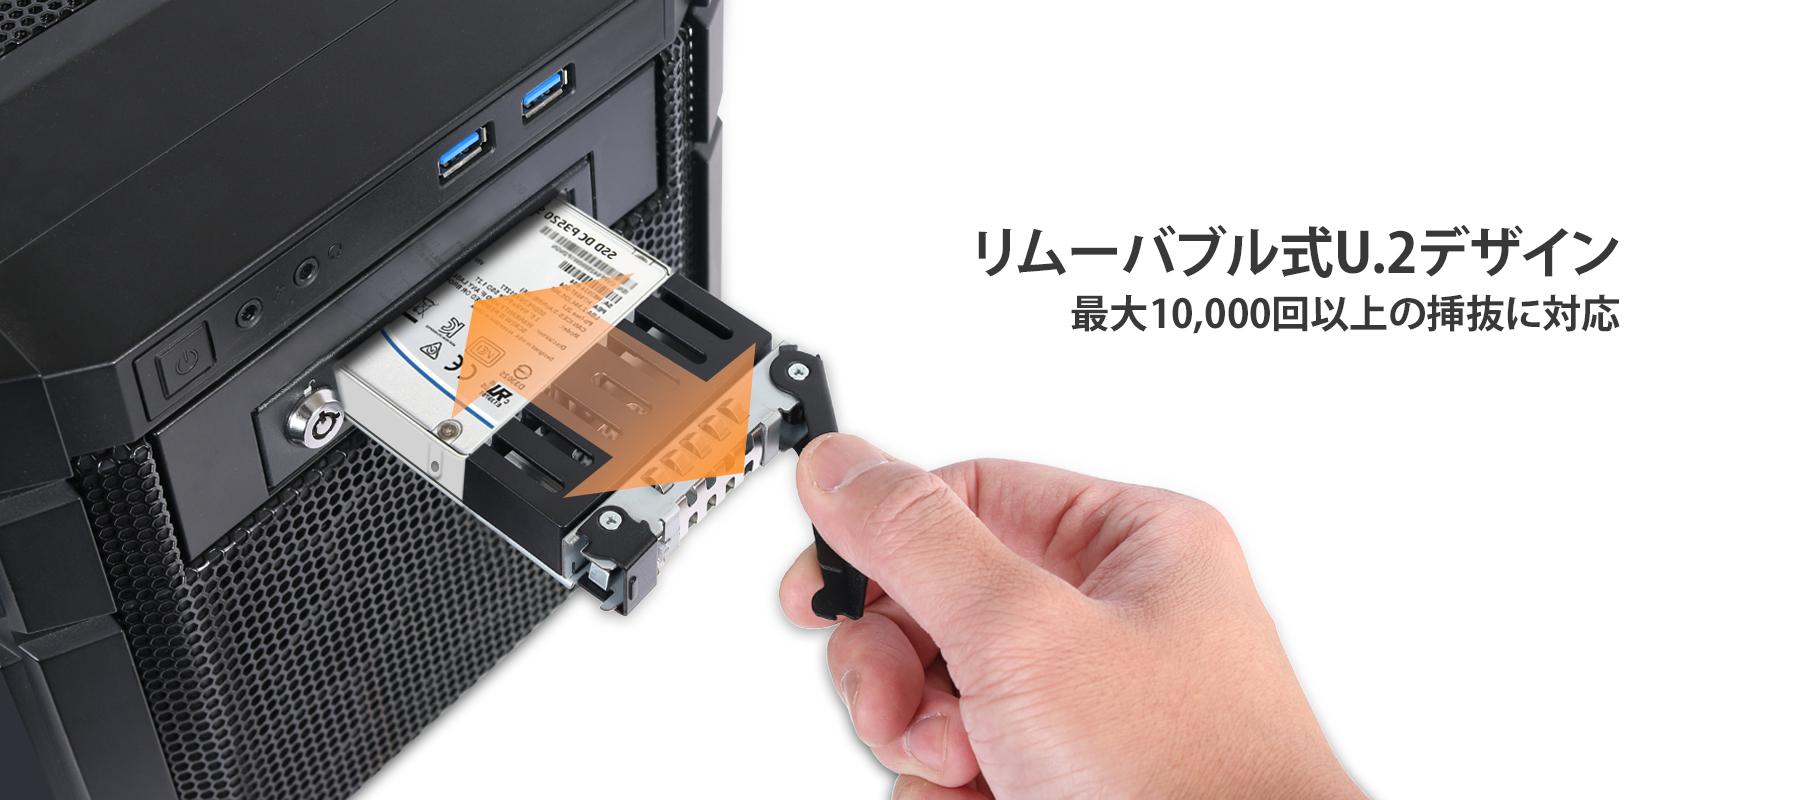 mb601vk-1b ホットスワップ 可能な U.2 SSD リムーバブルケース